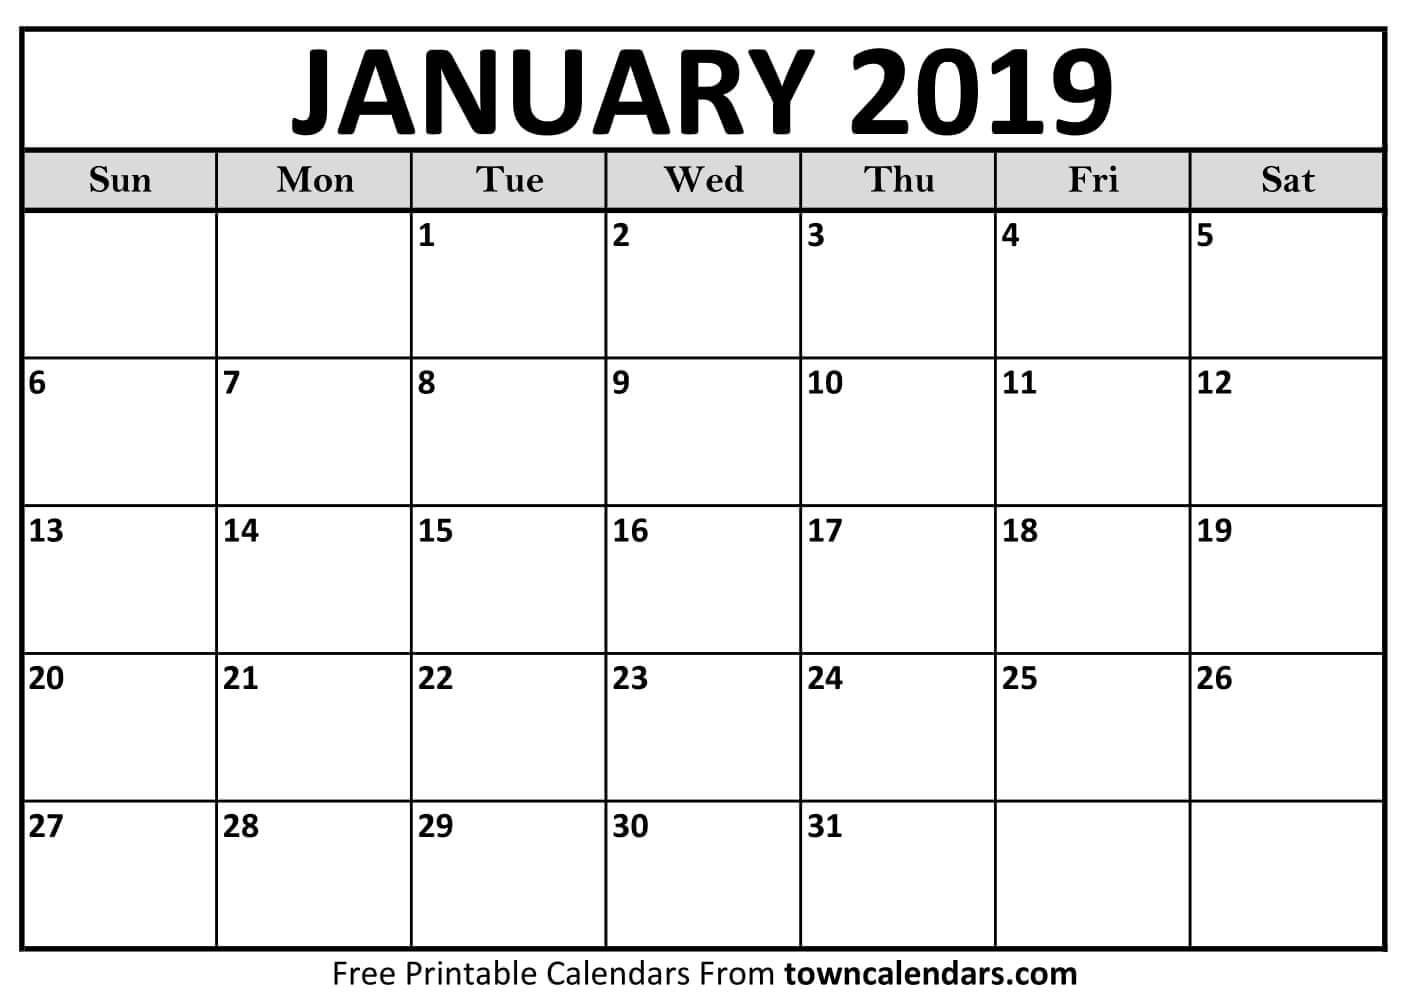 Printable Calendar January 2019 Printable January 2019 Calendar towncalendars